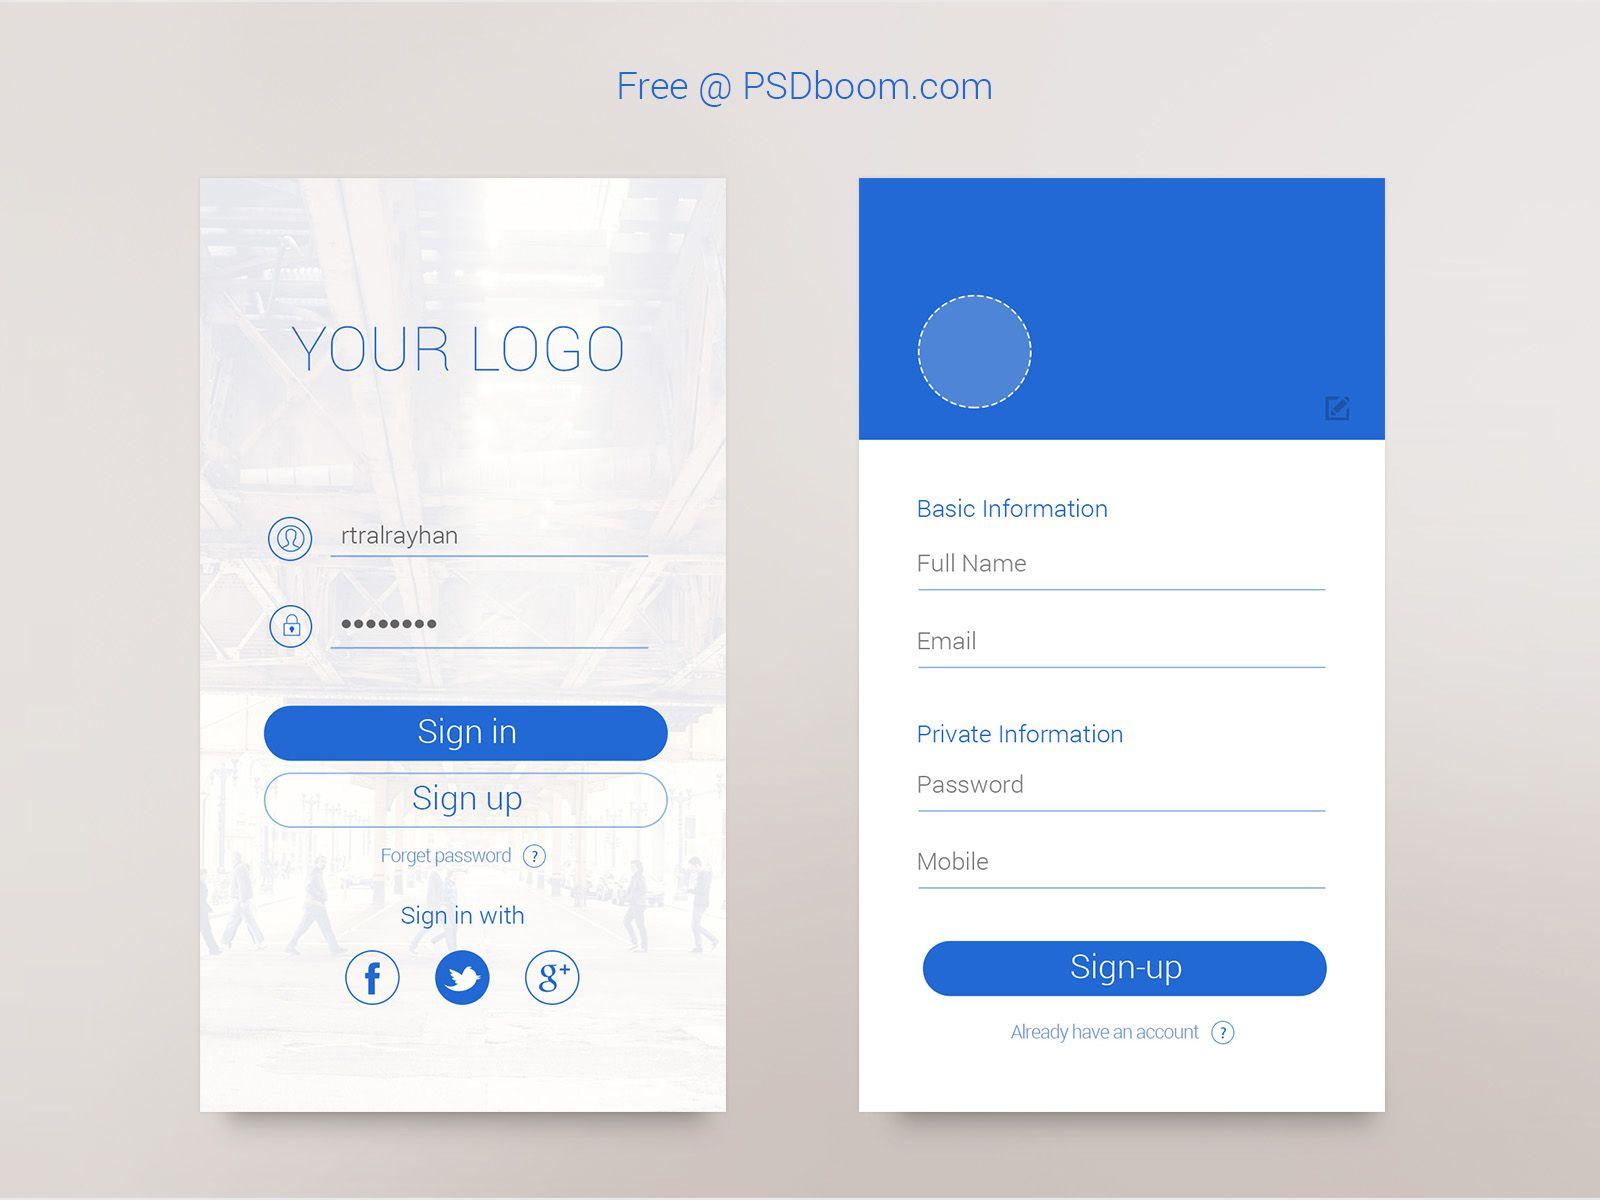 Iphone6 Sign Up Free Psd Signin App Login Form Pinterest App